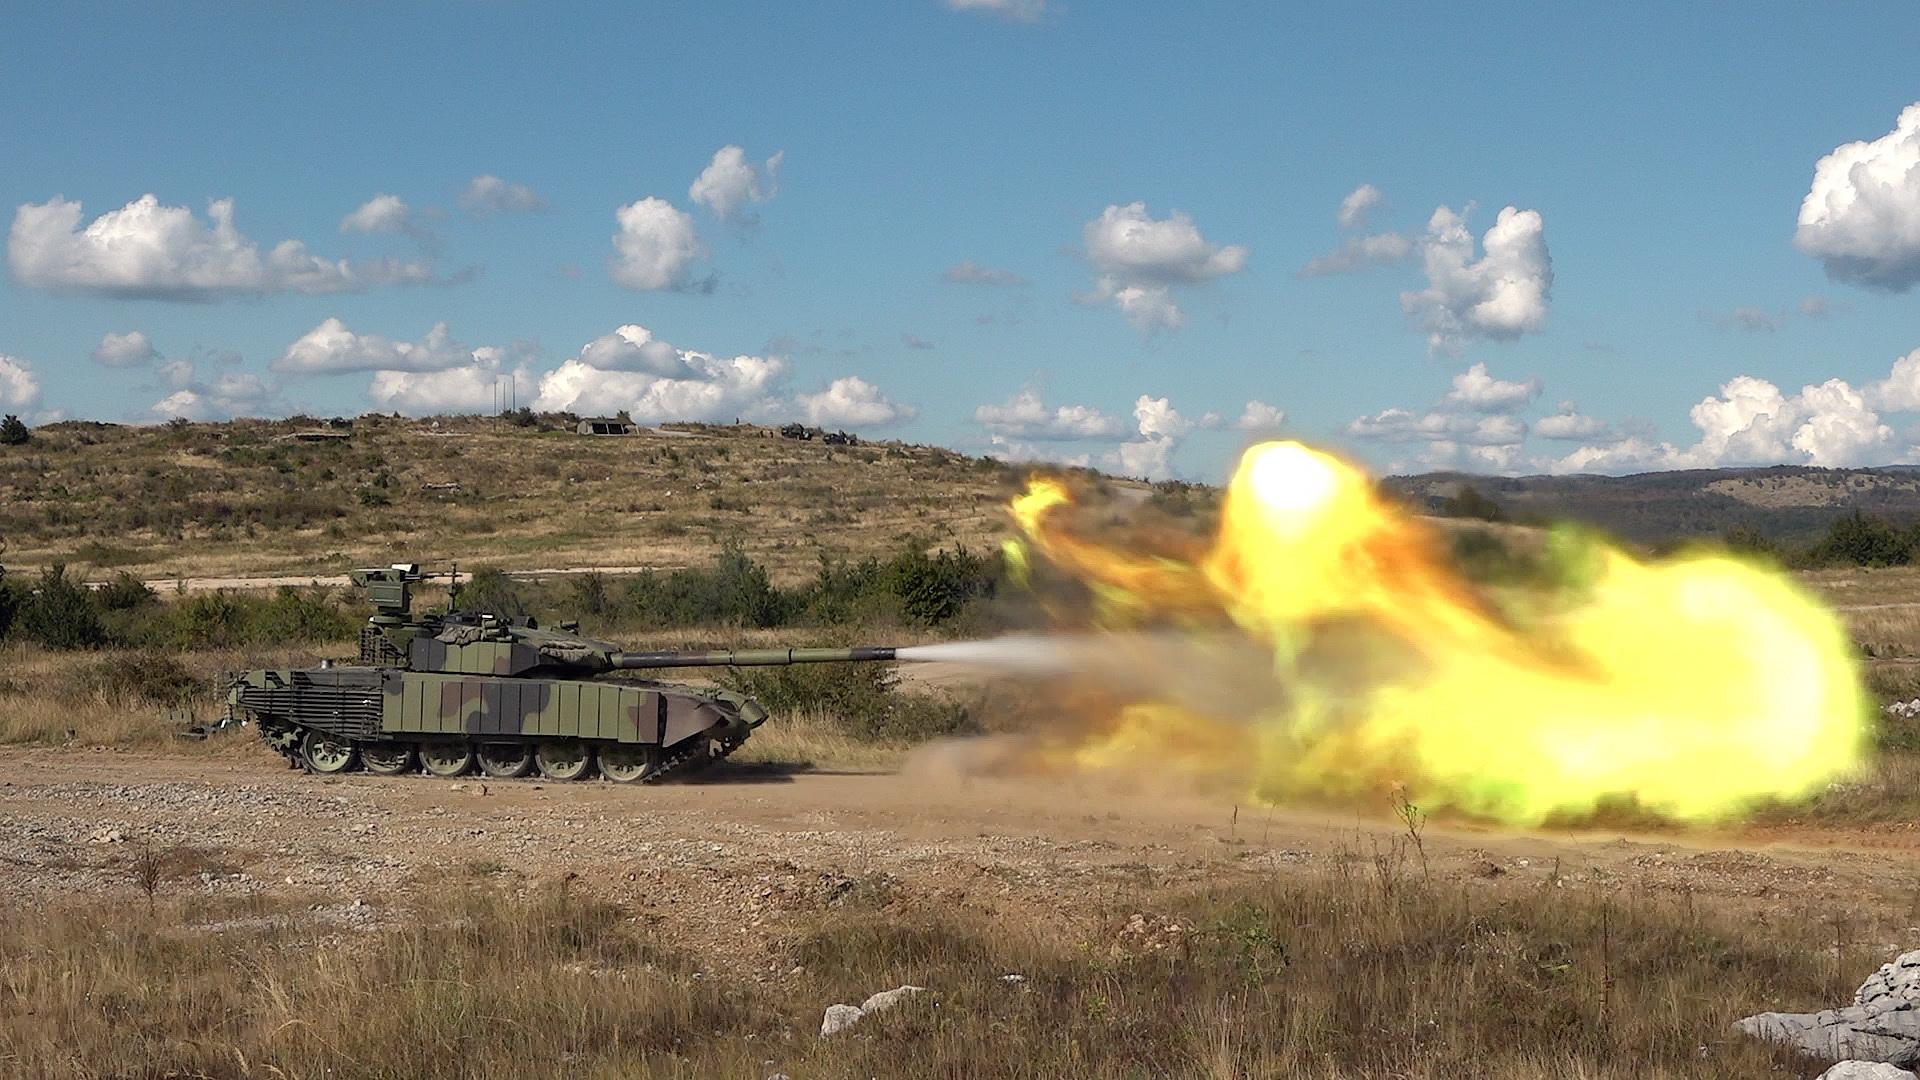 Srbija predstavila modernizirani M84 AS1 Serbian-ministry-of-defence-showcases-upgraded-m-84-as1-main-attle-tanks